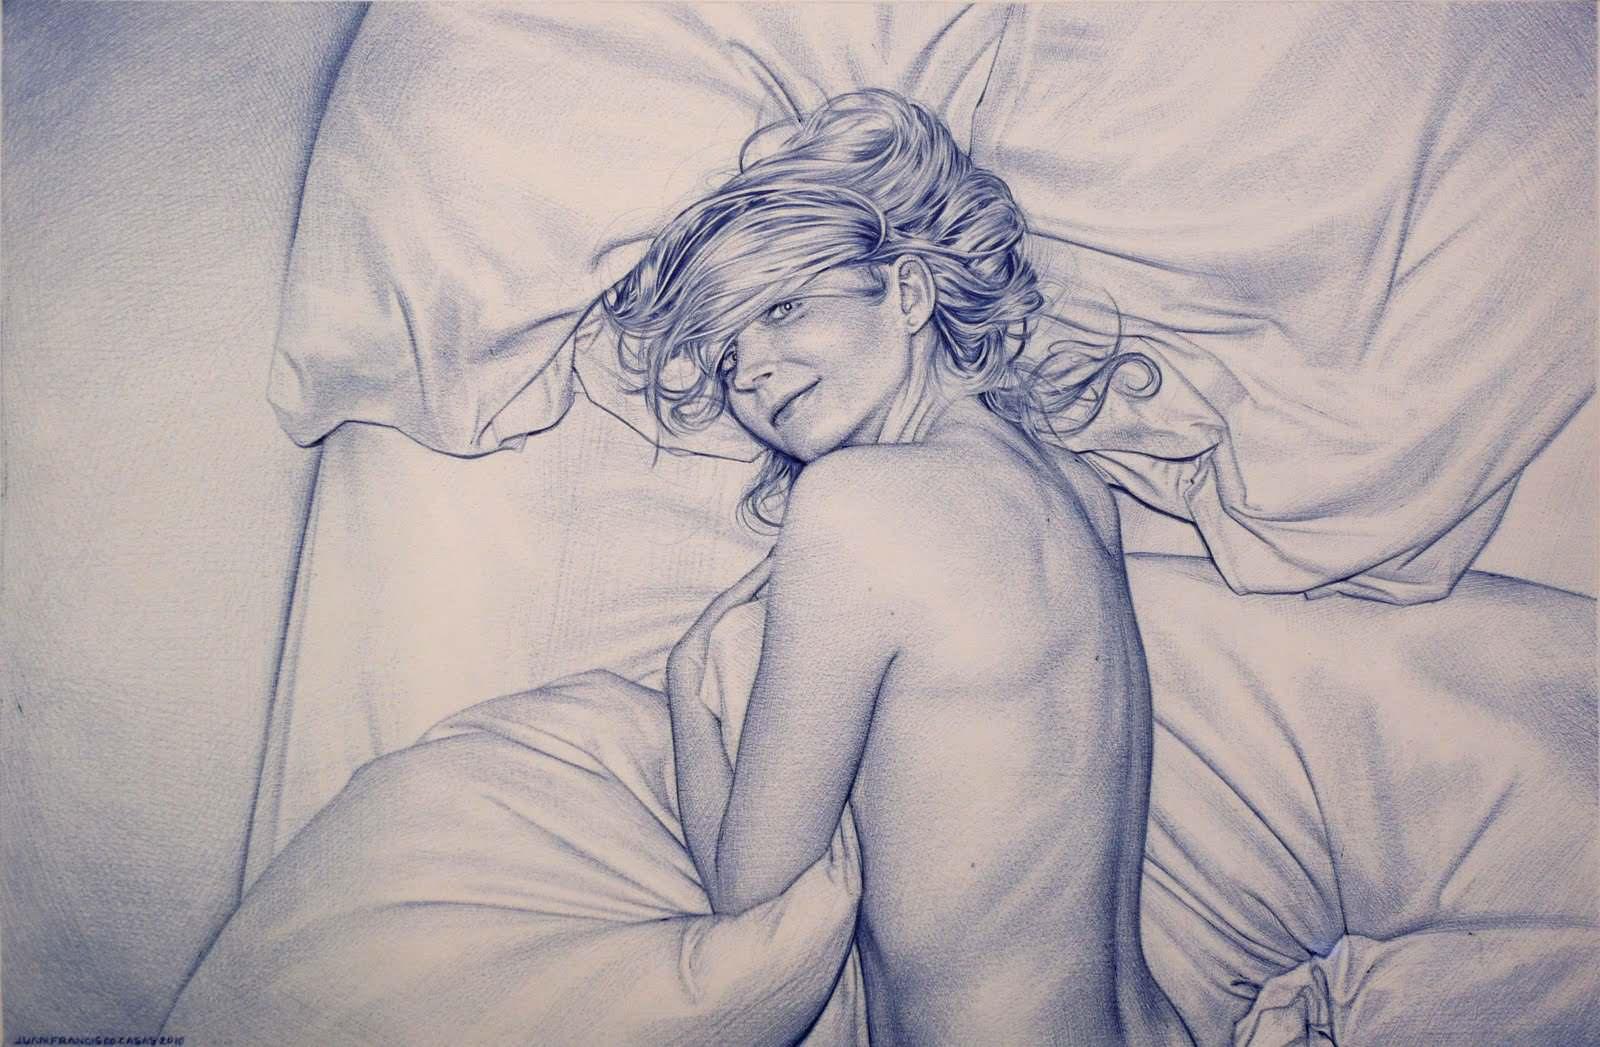 juan-francisco-cavas-realismo-caneta-esferografica-bic-oleo-sobre-tela-pintura-dionisio-arte-7.jpg